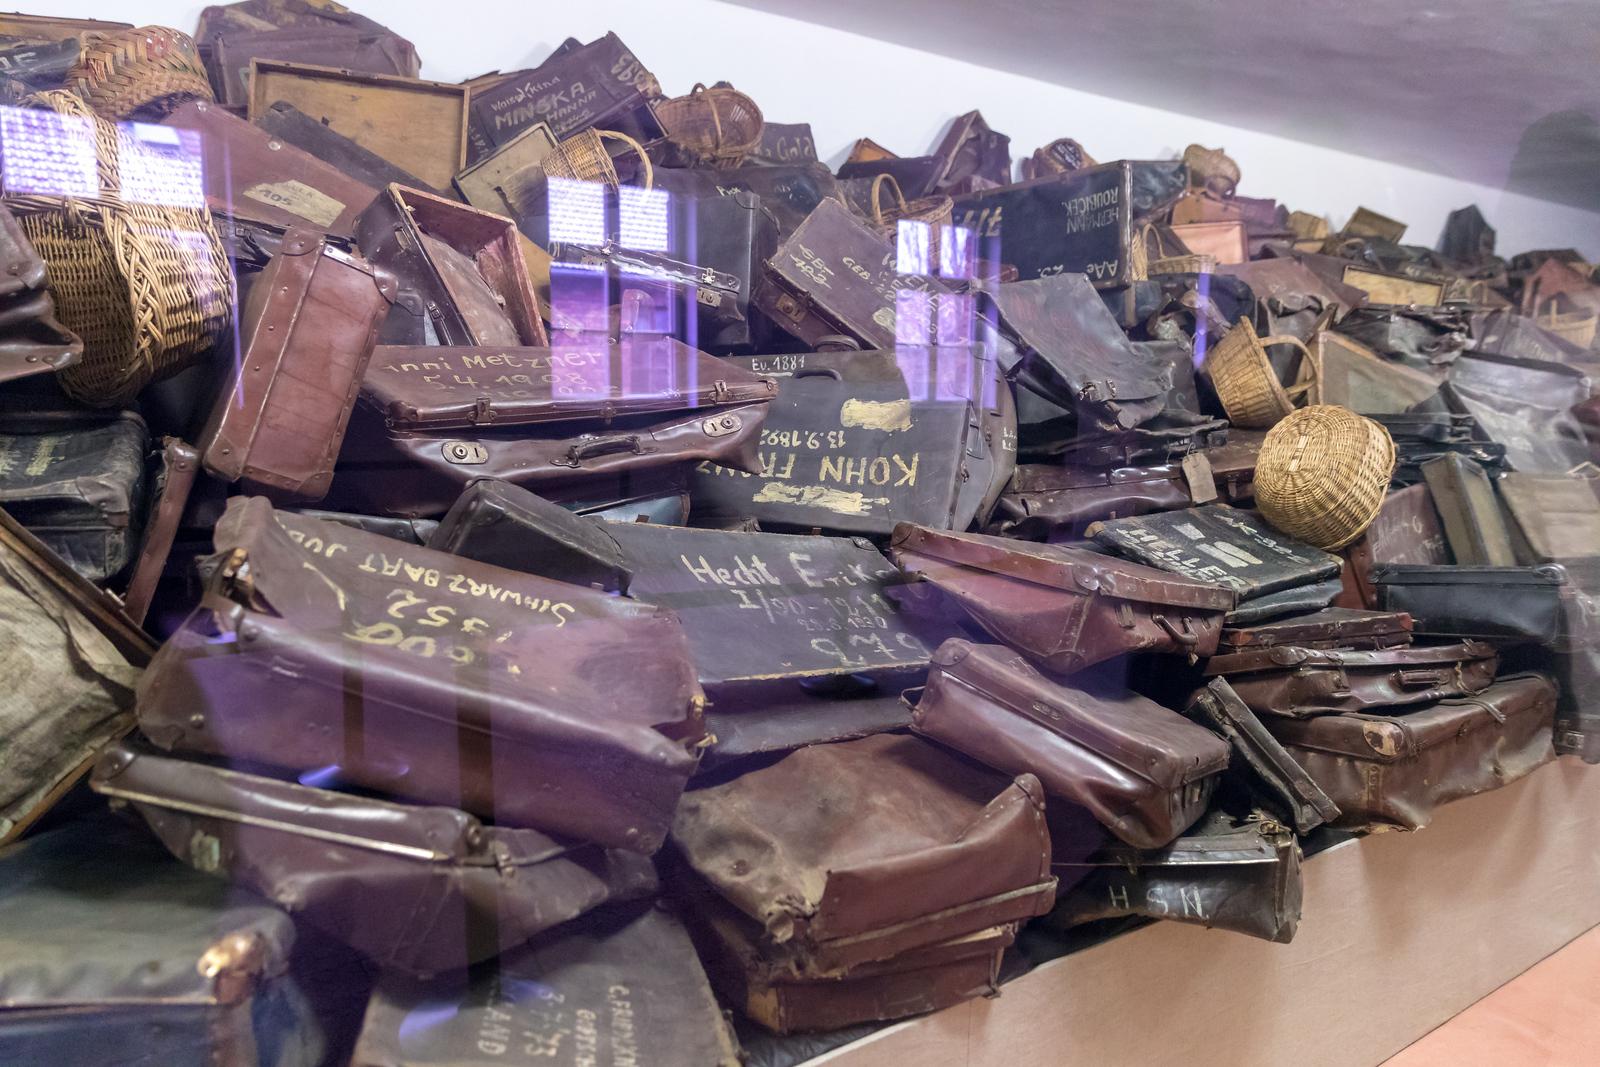 IMG_2321 - Victims' Luggage